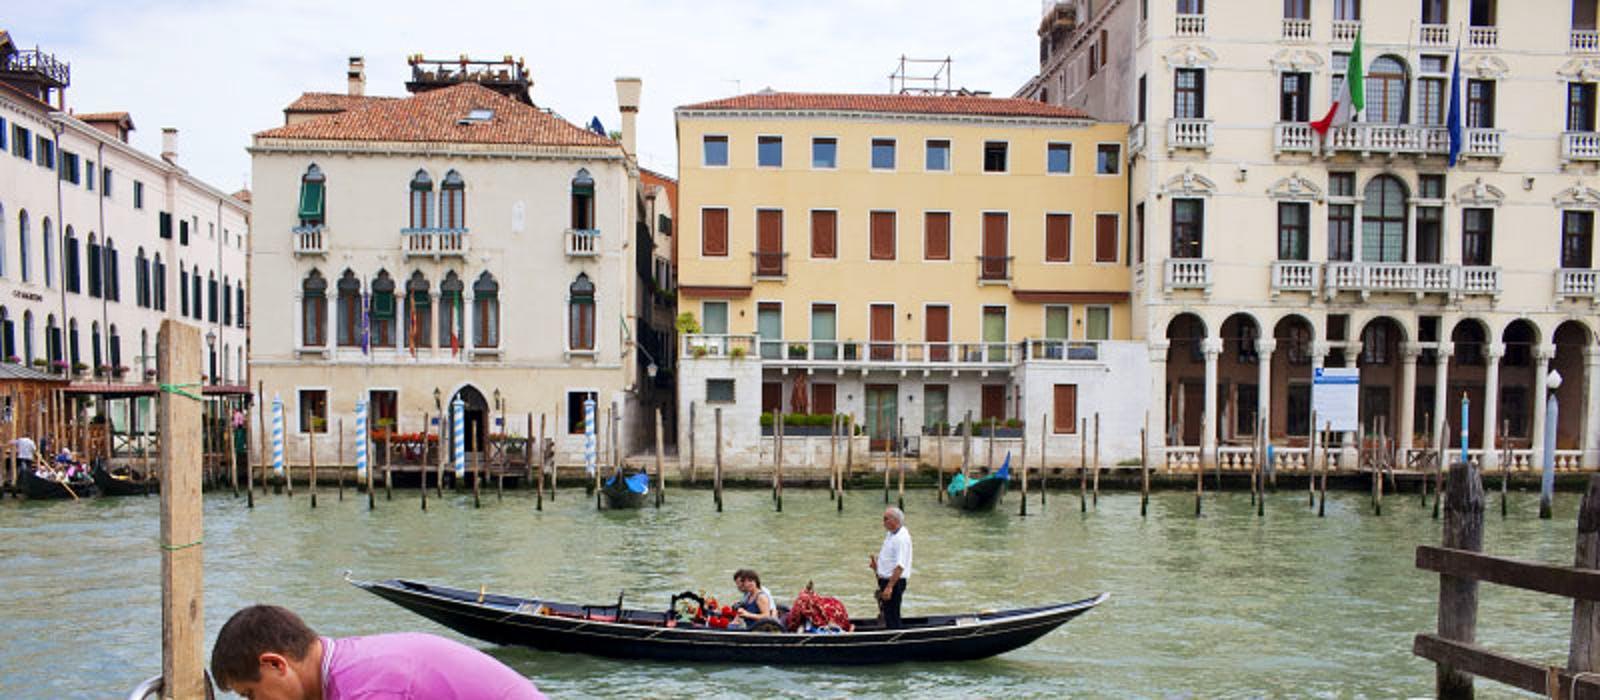 original_Dench_Venice140.jpg